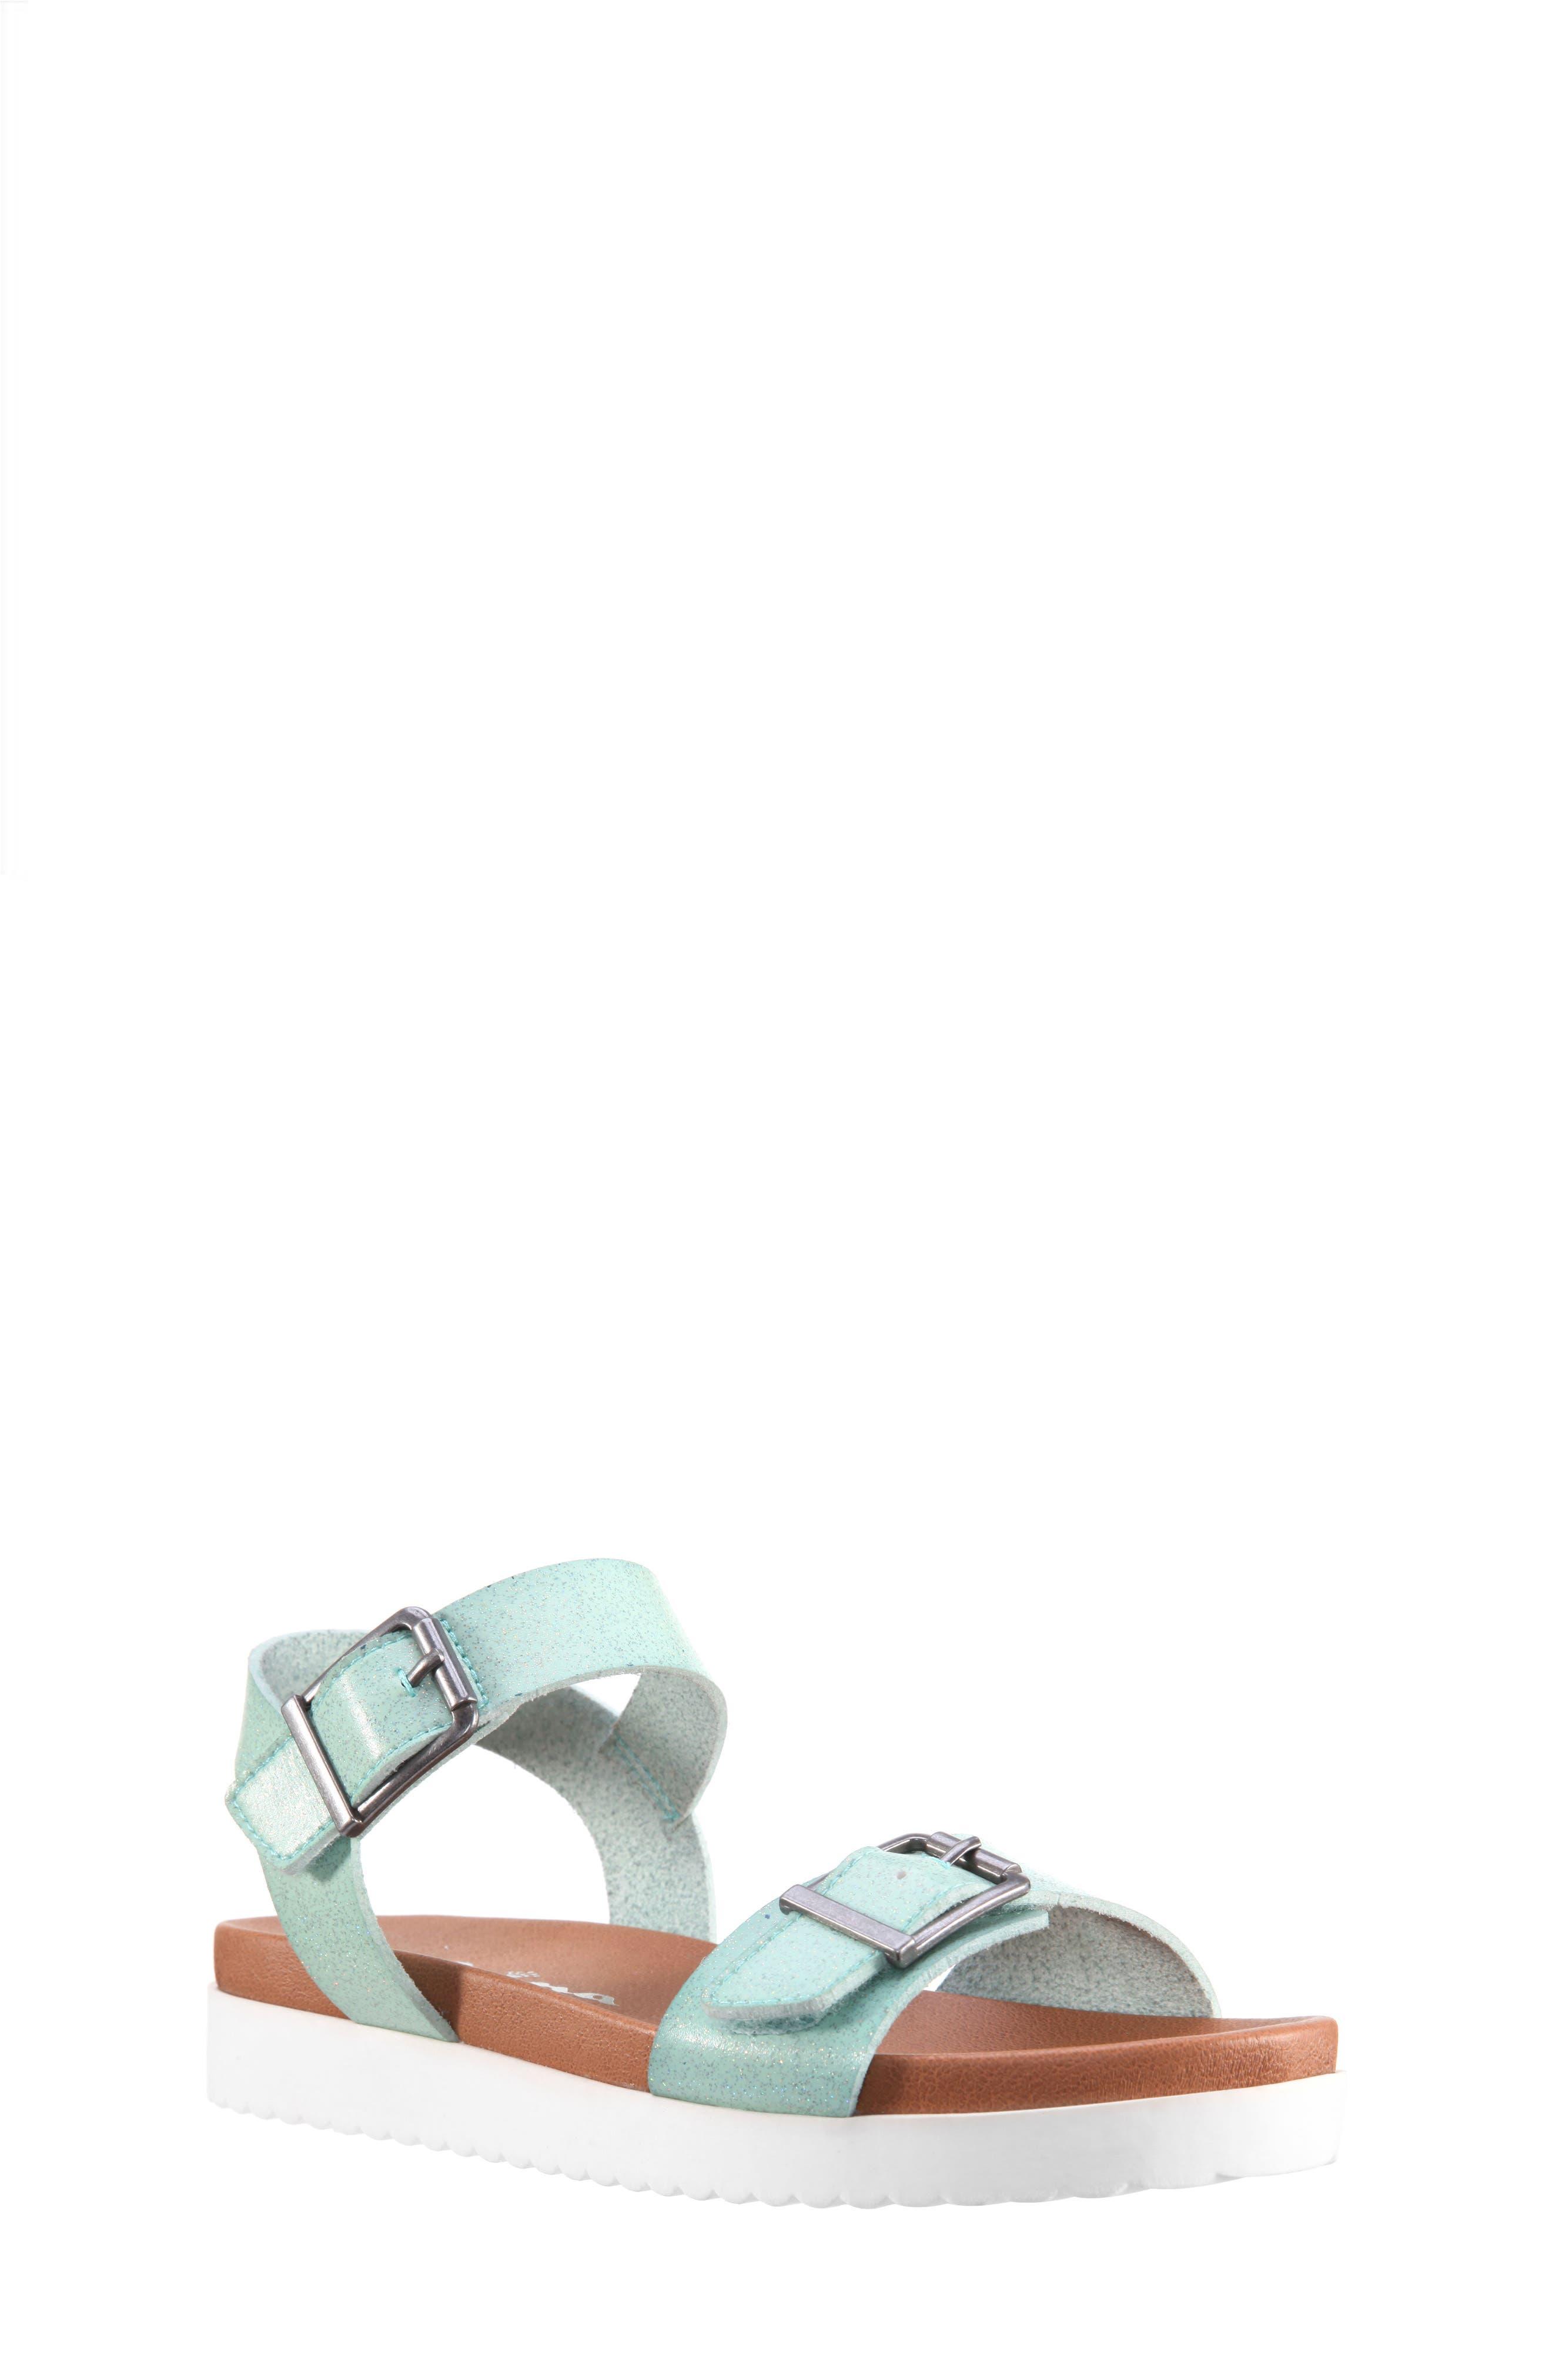 Jacklin3 Quarter Strap Sandal,                             Main thumbnail 1, color,                             Mint Dip Dye